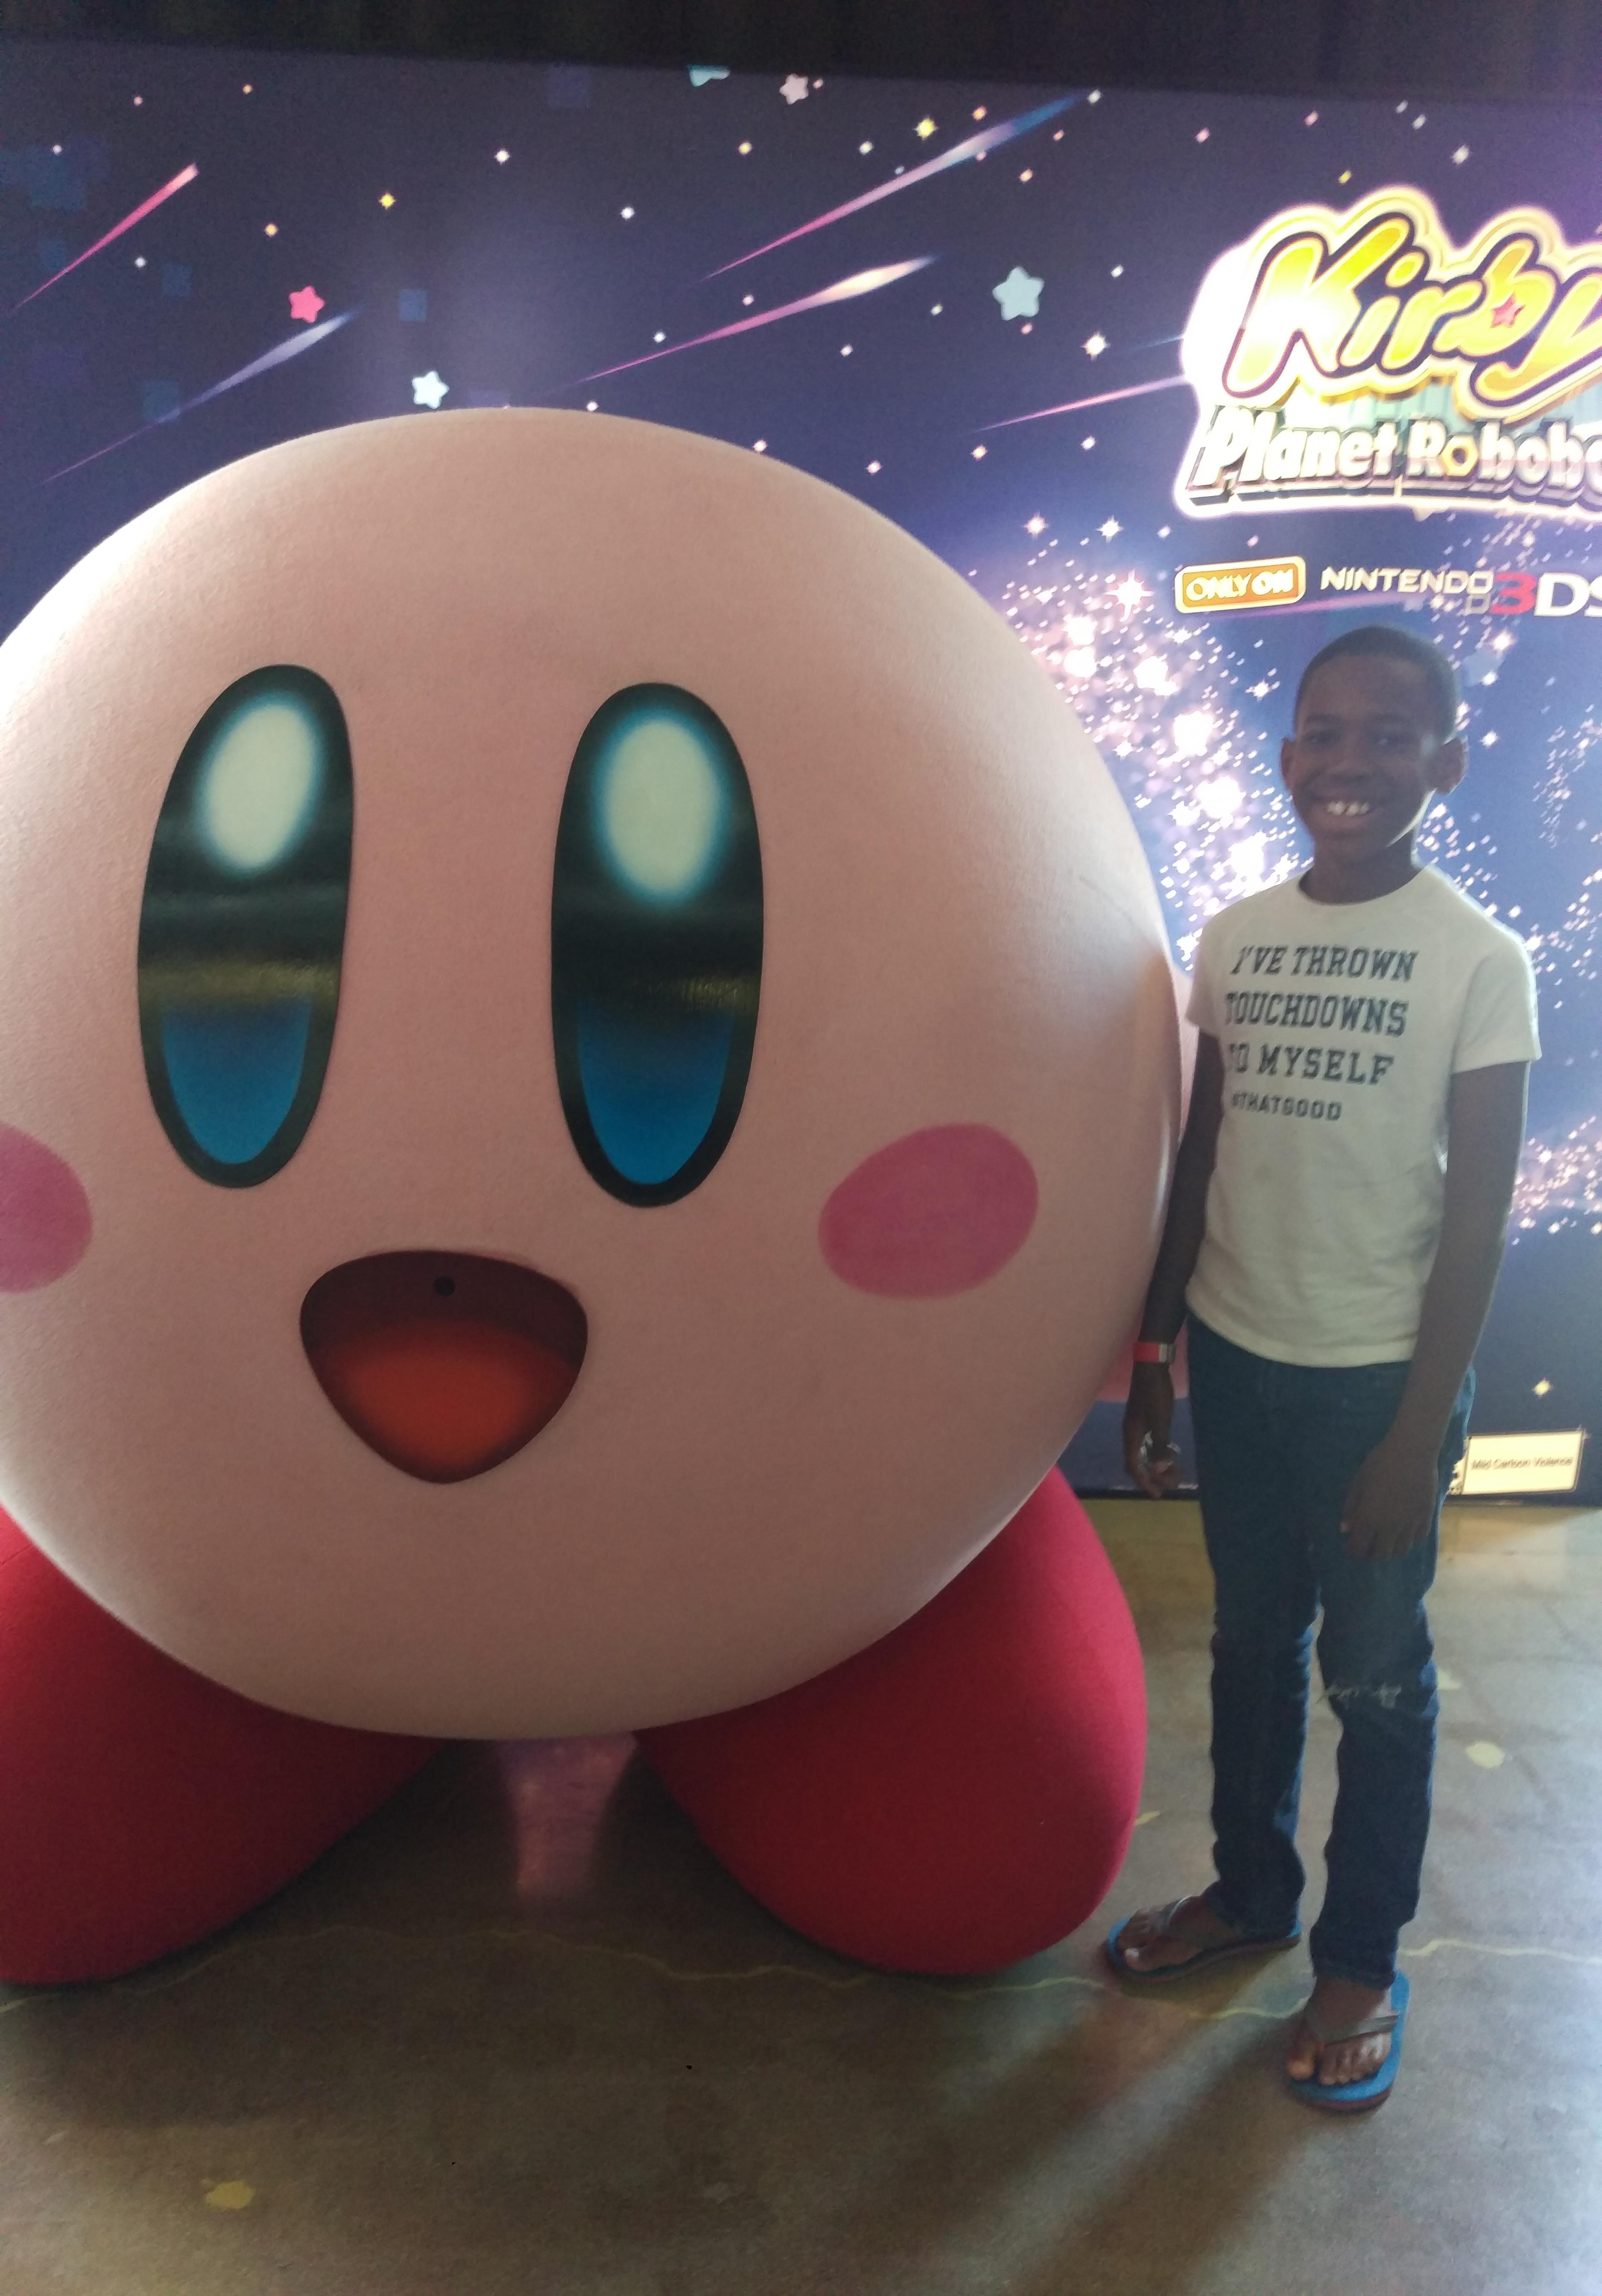 Kids Love Nintendo 3ds Game Kirby Planet Robobot Free